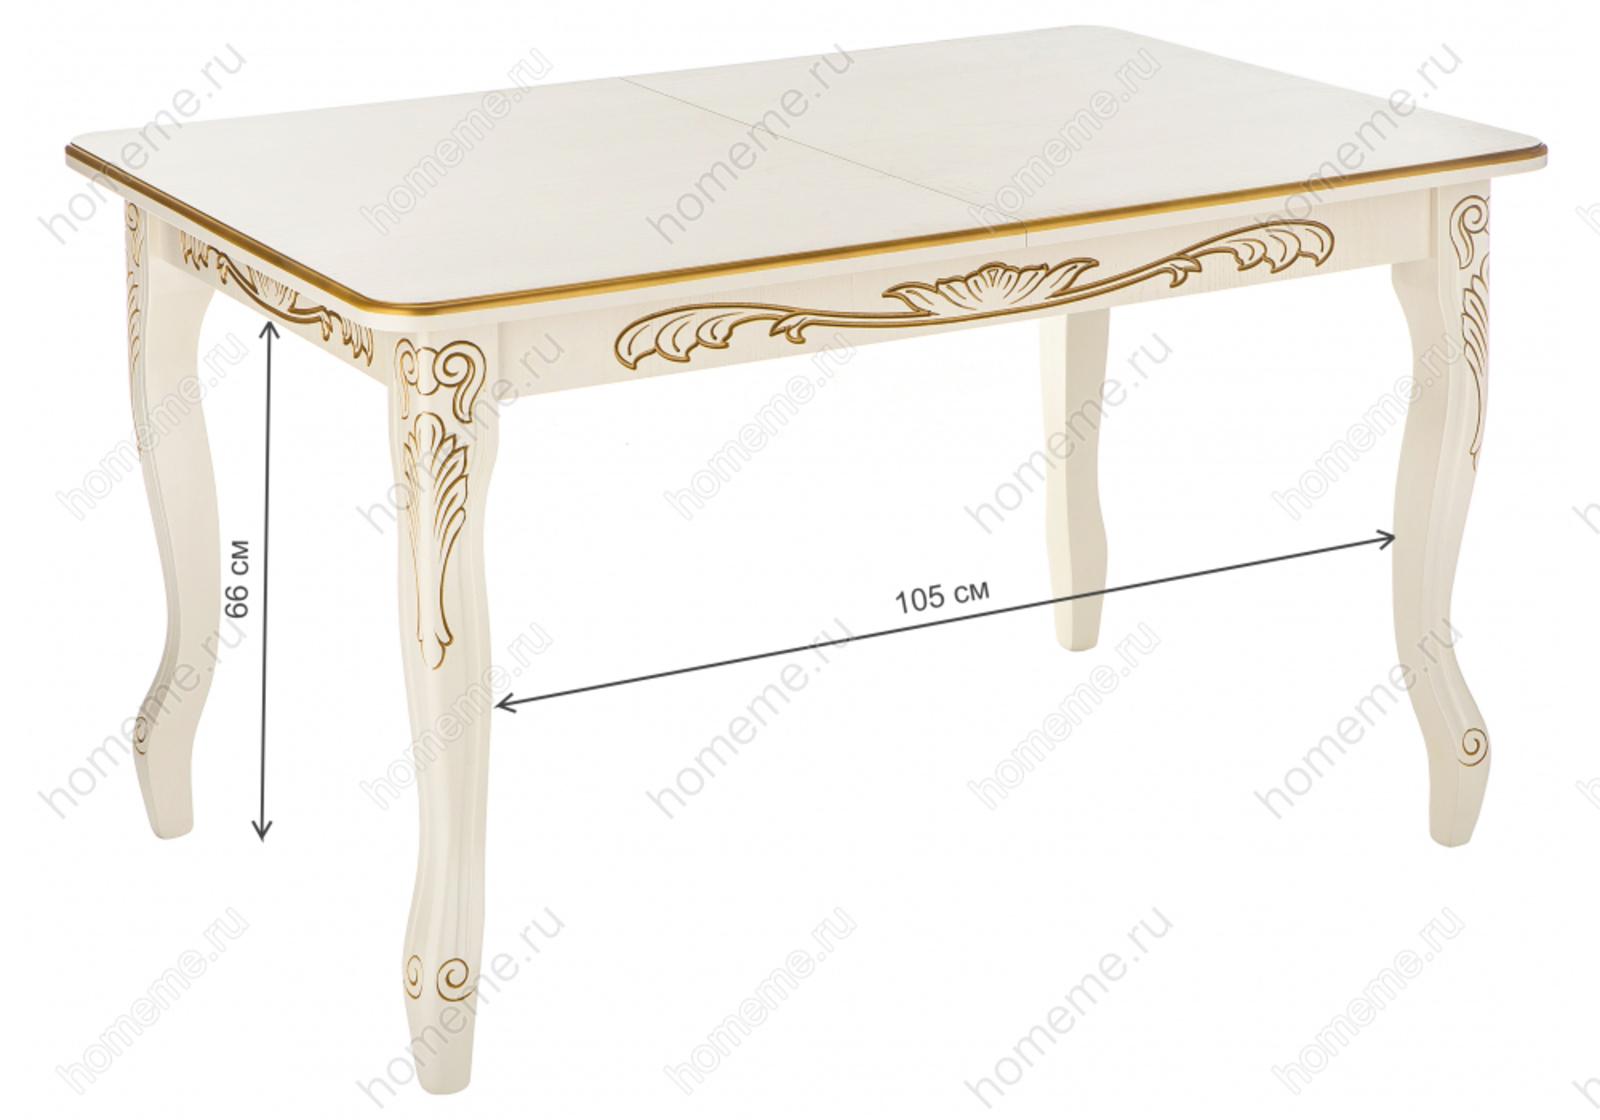 Стол деревянный Мауро патина золото 318616 Мауро патина золото 318616 (16205)